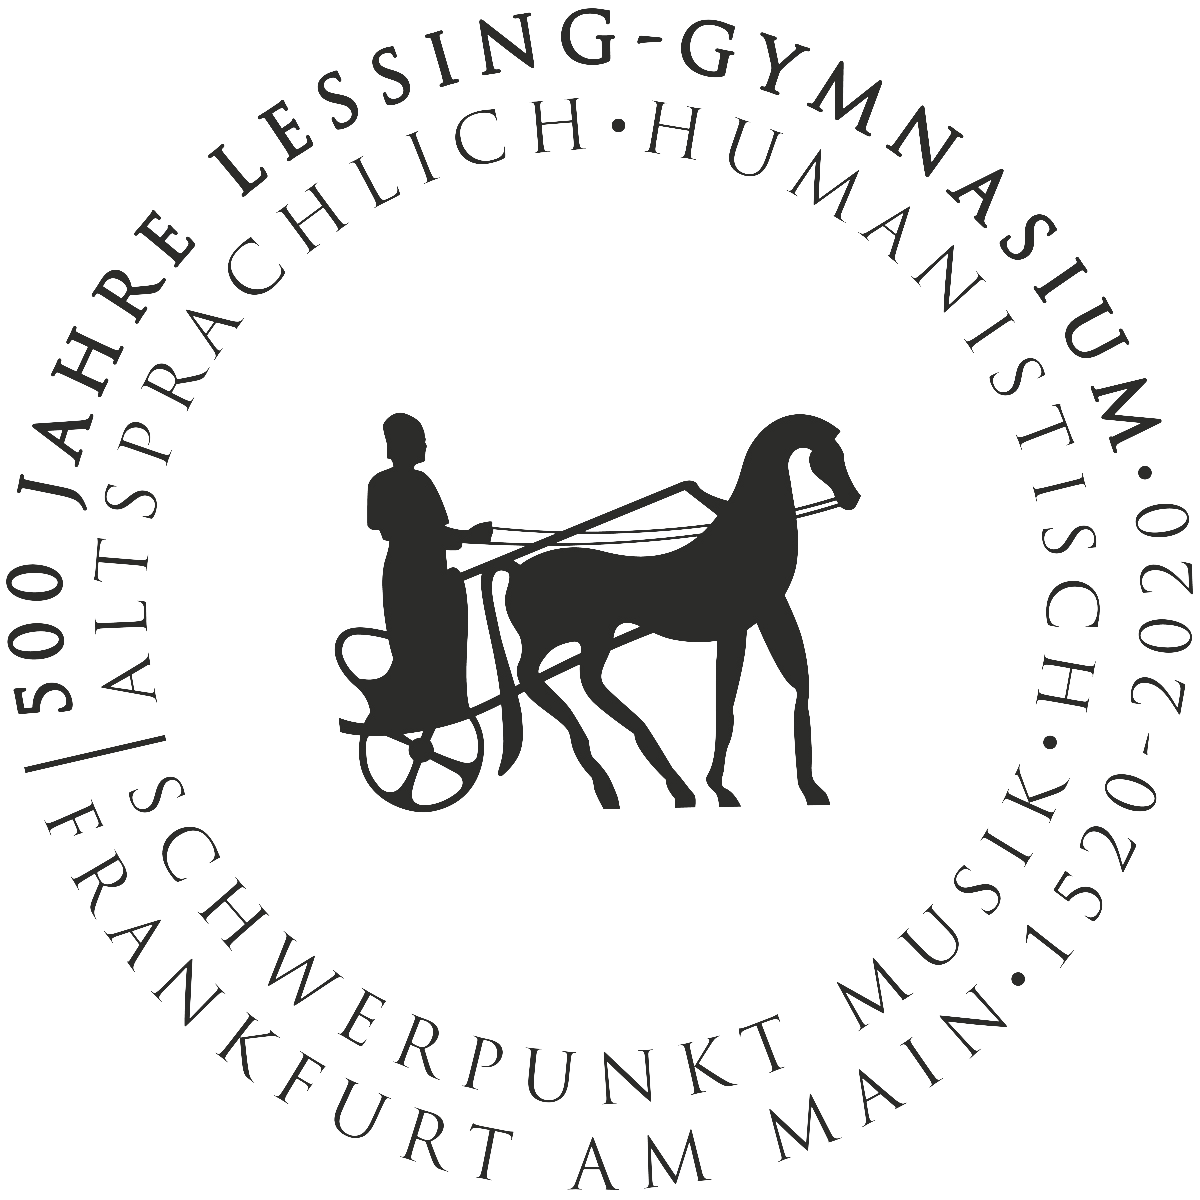 Lessing-Gymnasium